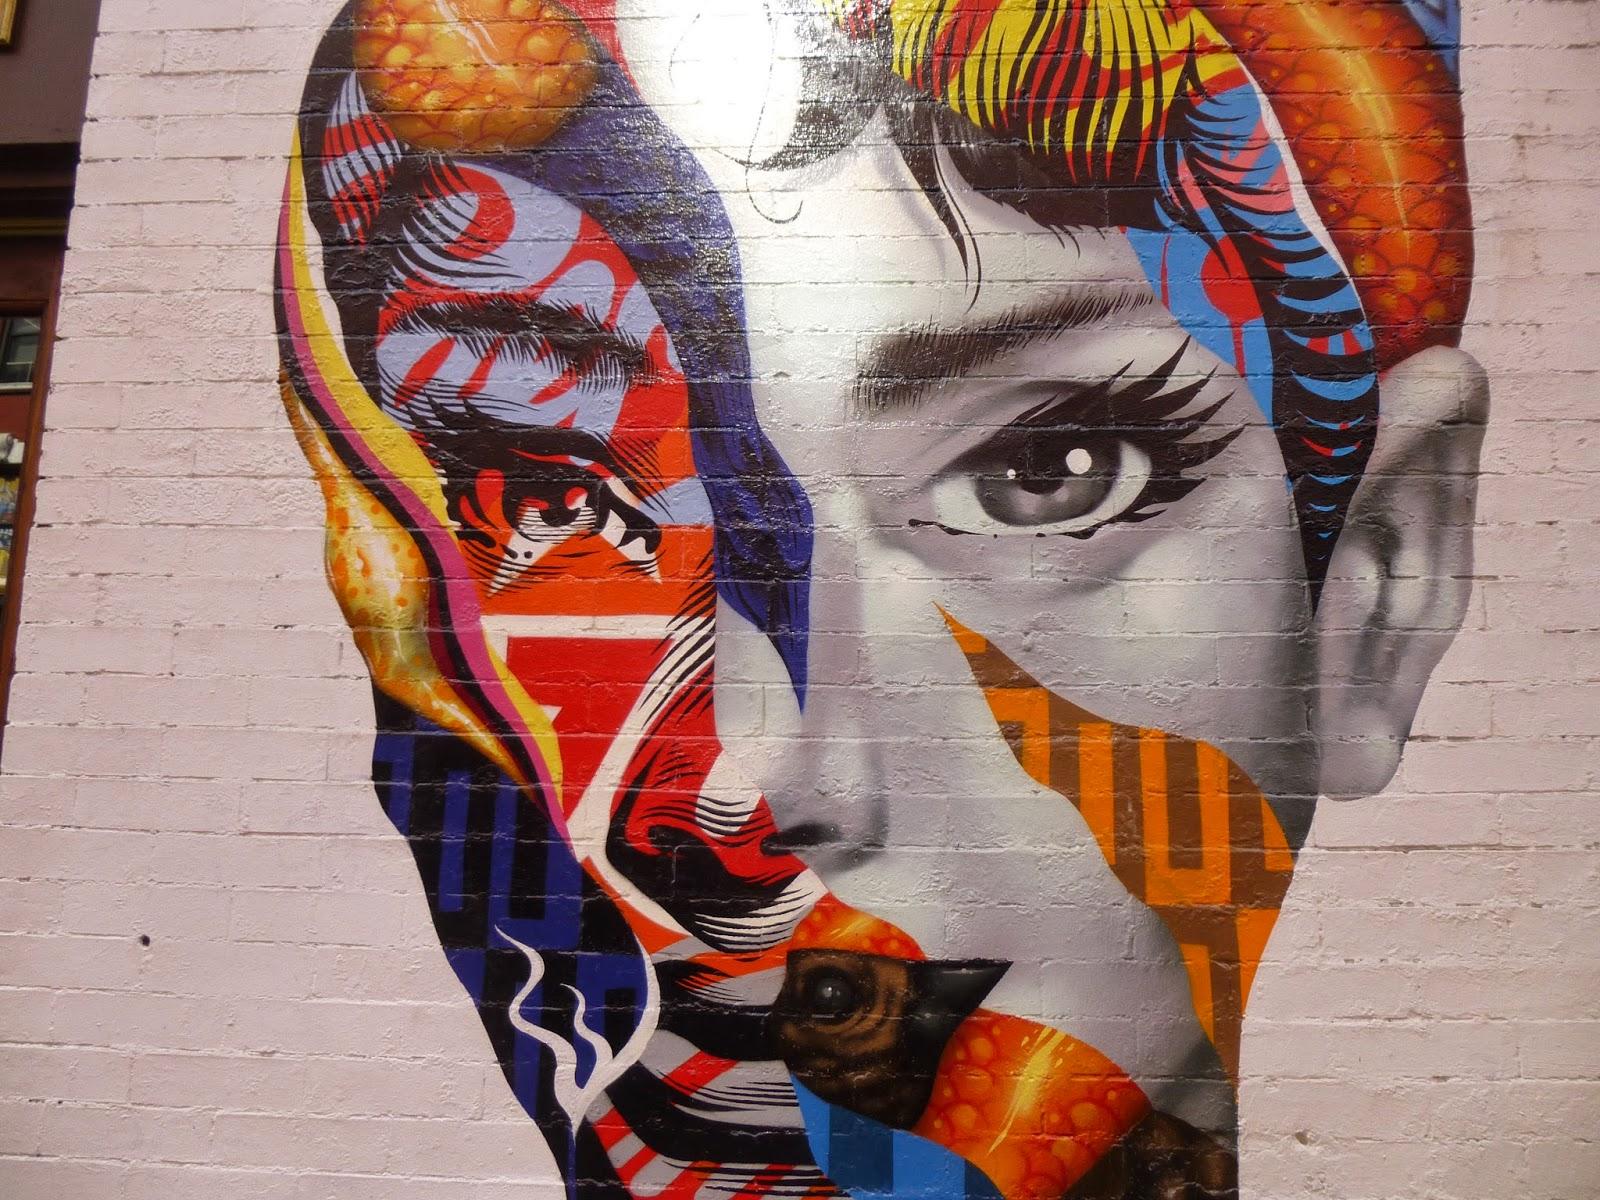 Le Street Art à New York |Nyc Street Art